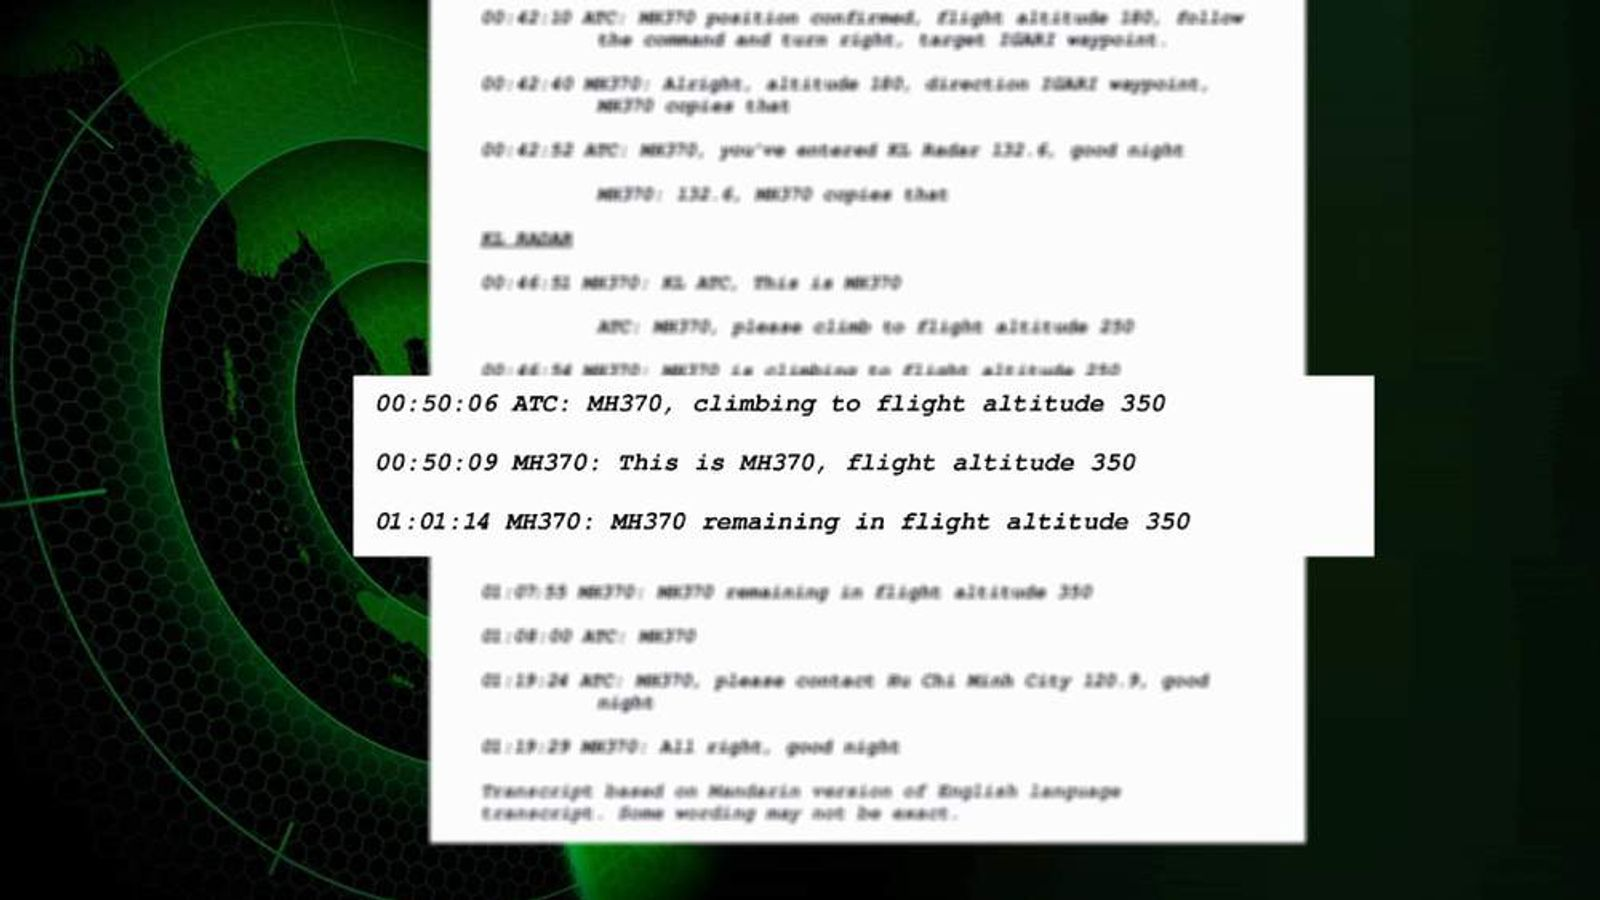 220314 Missing Plane Transcript screengrab